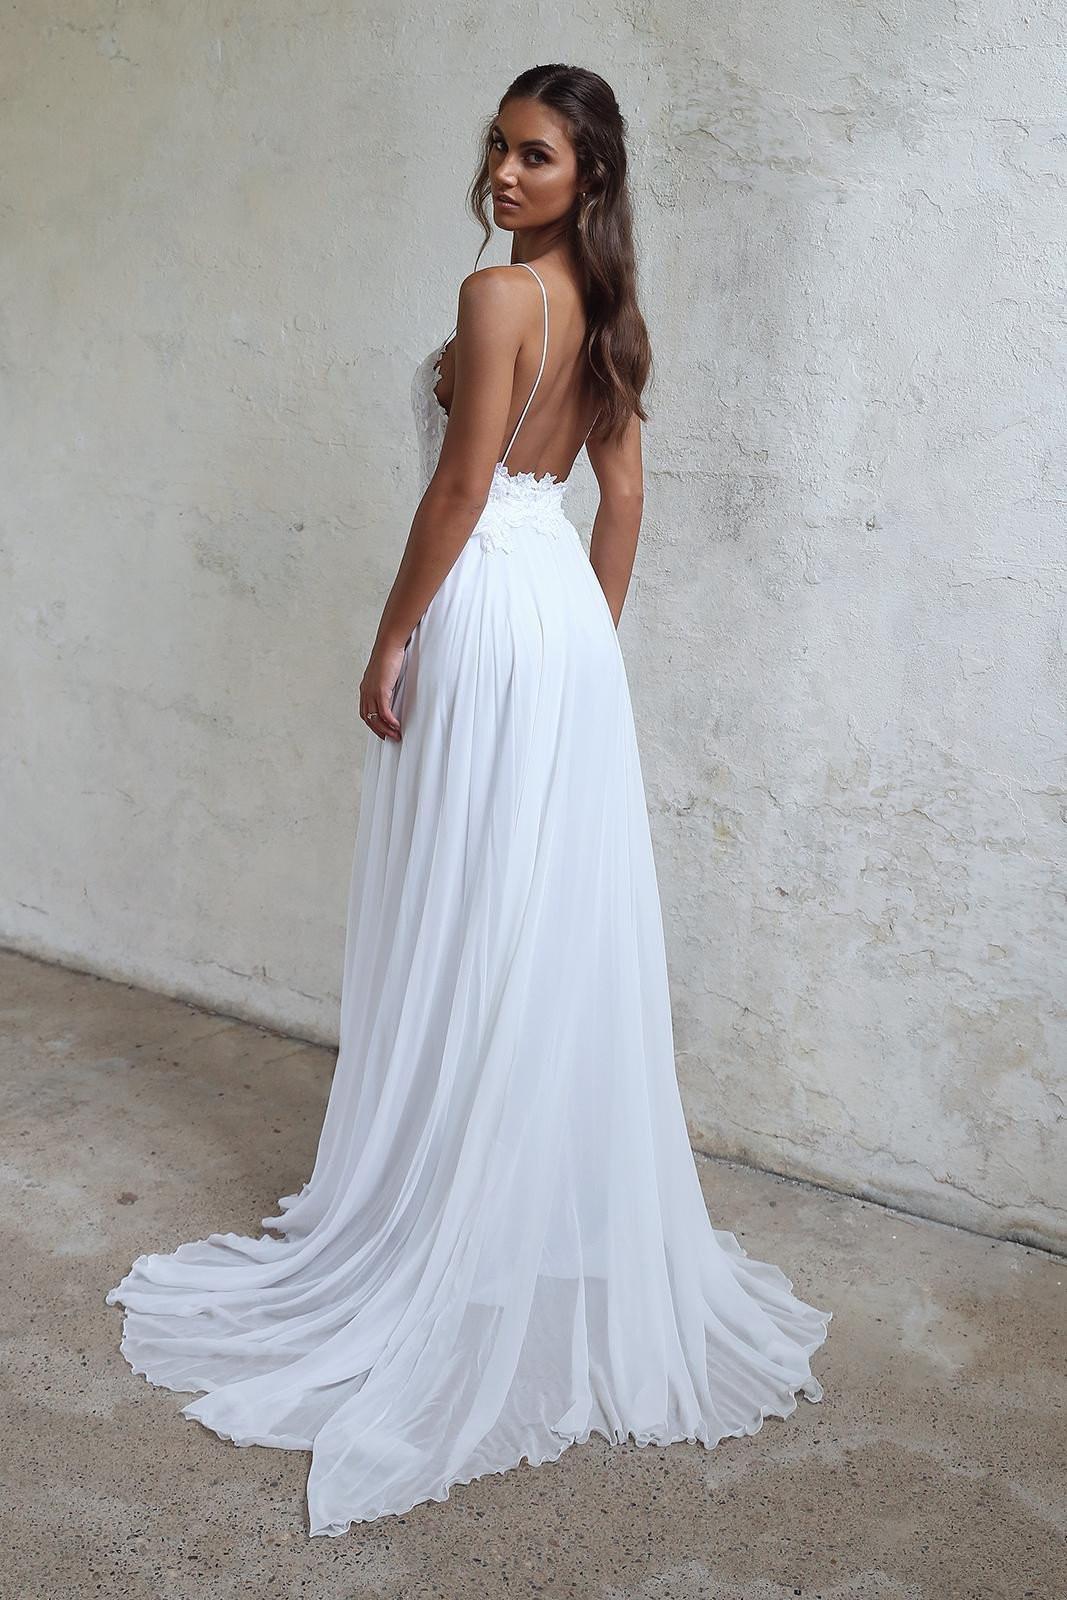 Spaghetti Strap Wedding Dresses  Sale Absorbing Spaghetti Strap Wedding Dresses White